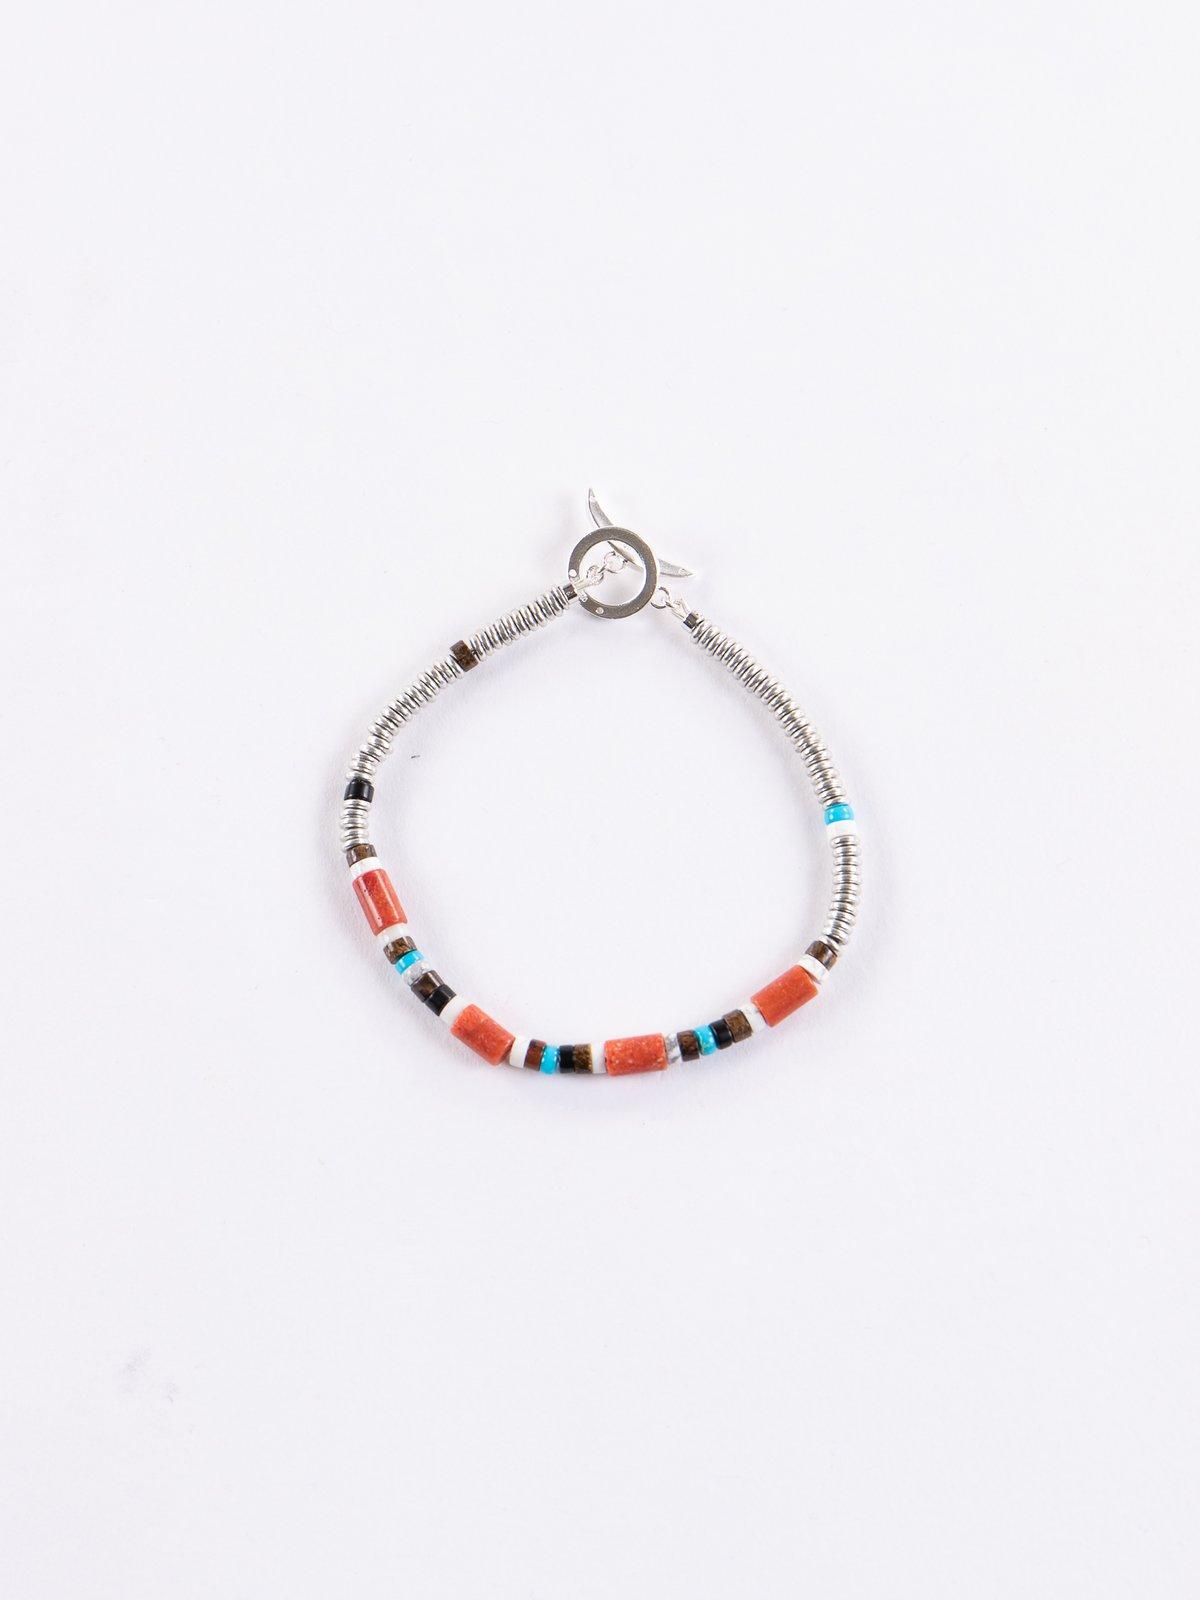 Coral Tube Beads Bracelet - Image 1